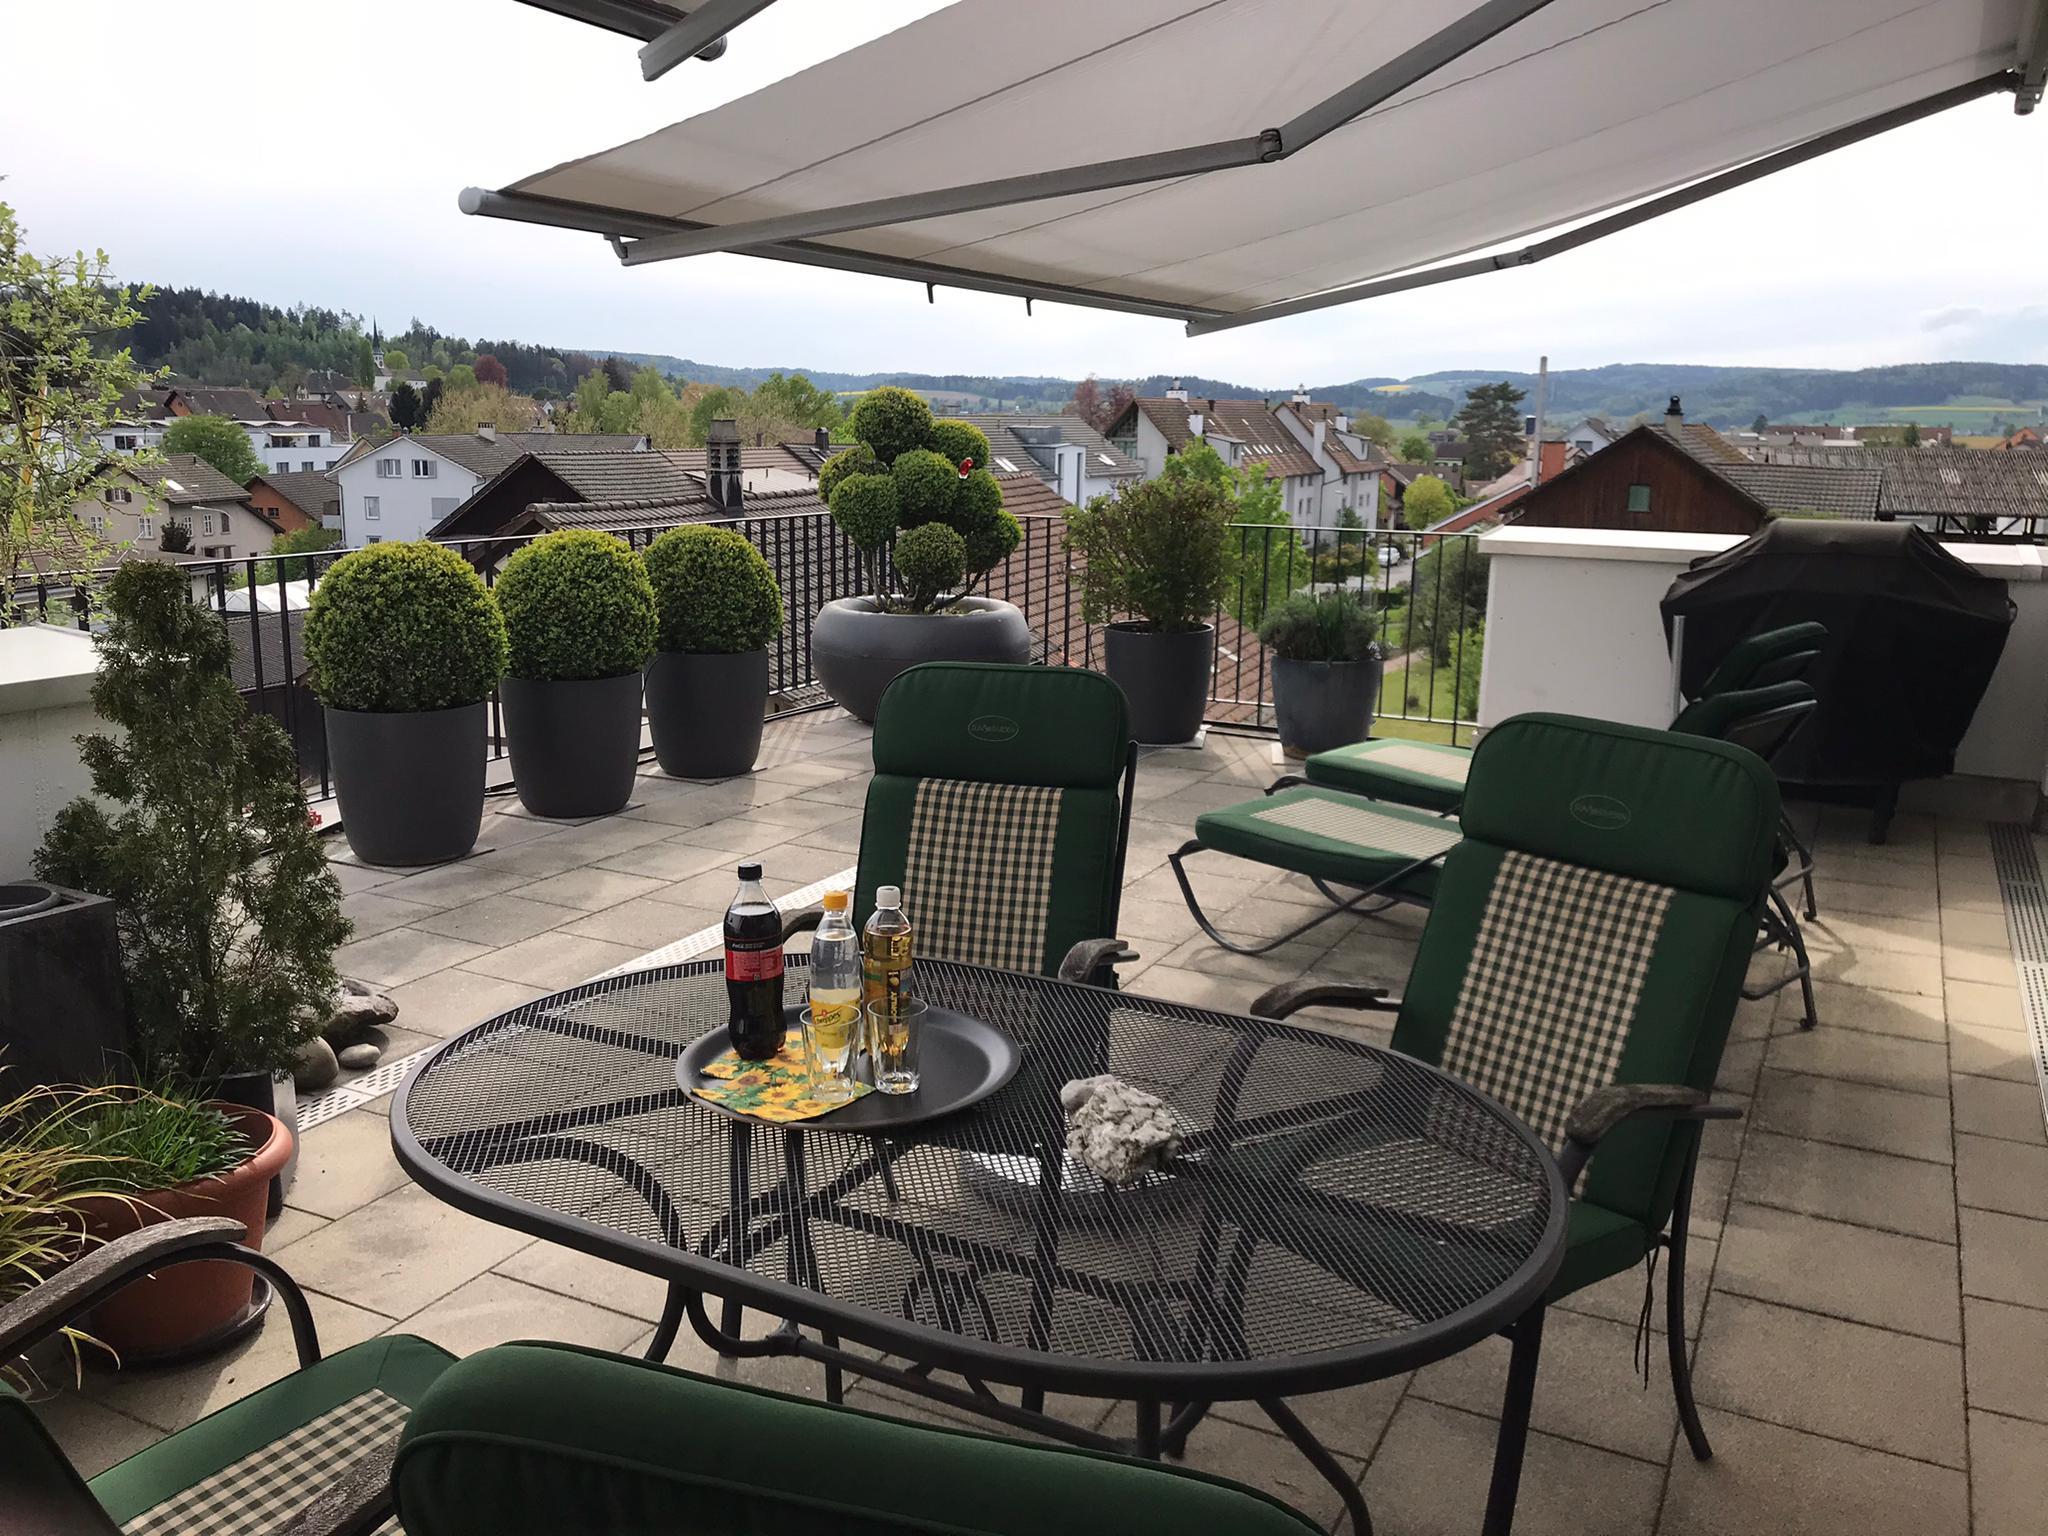 Haupt-Terrasse im Sommer